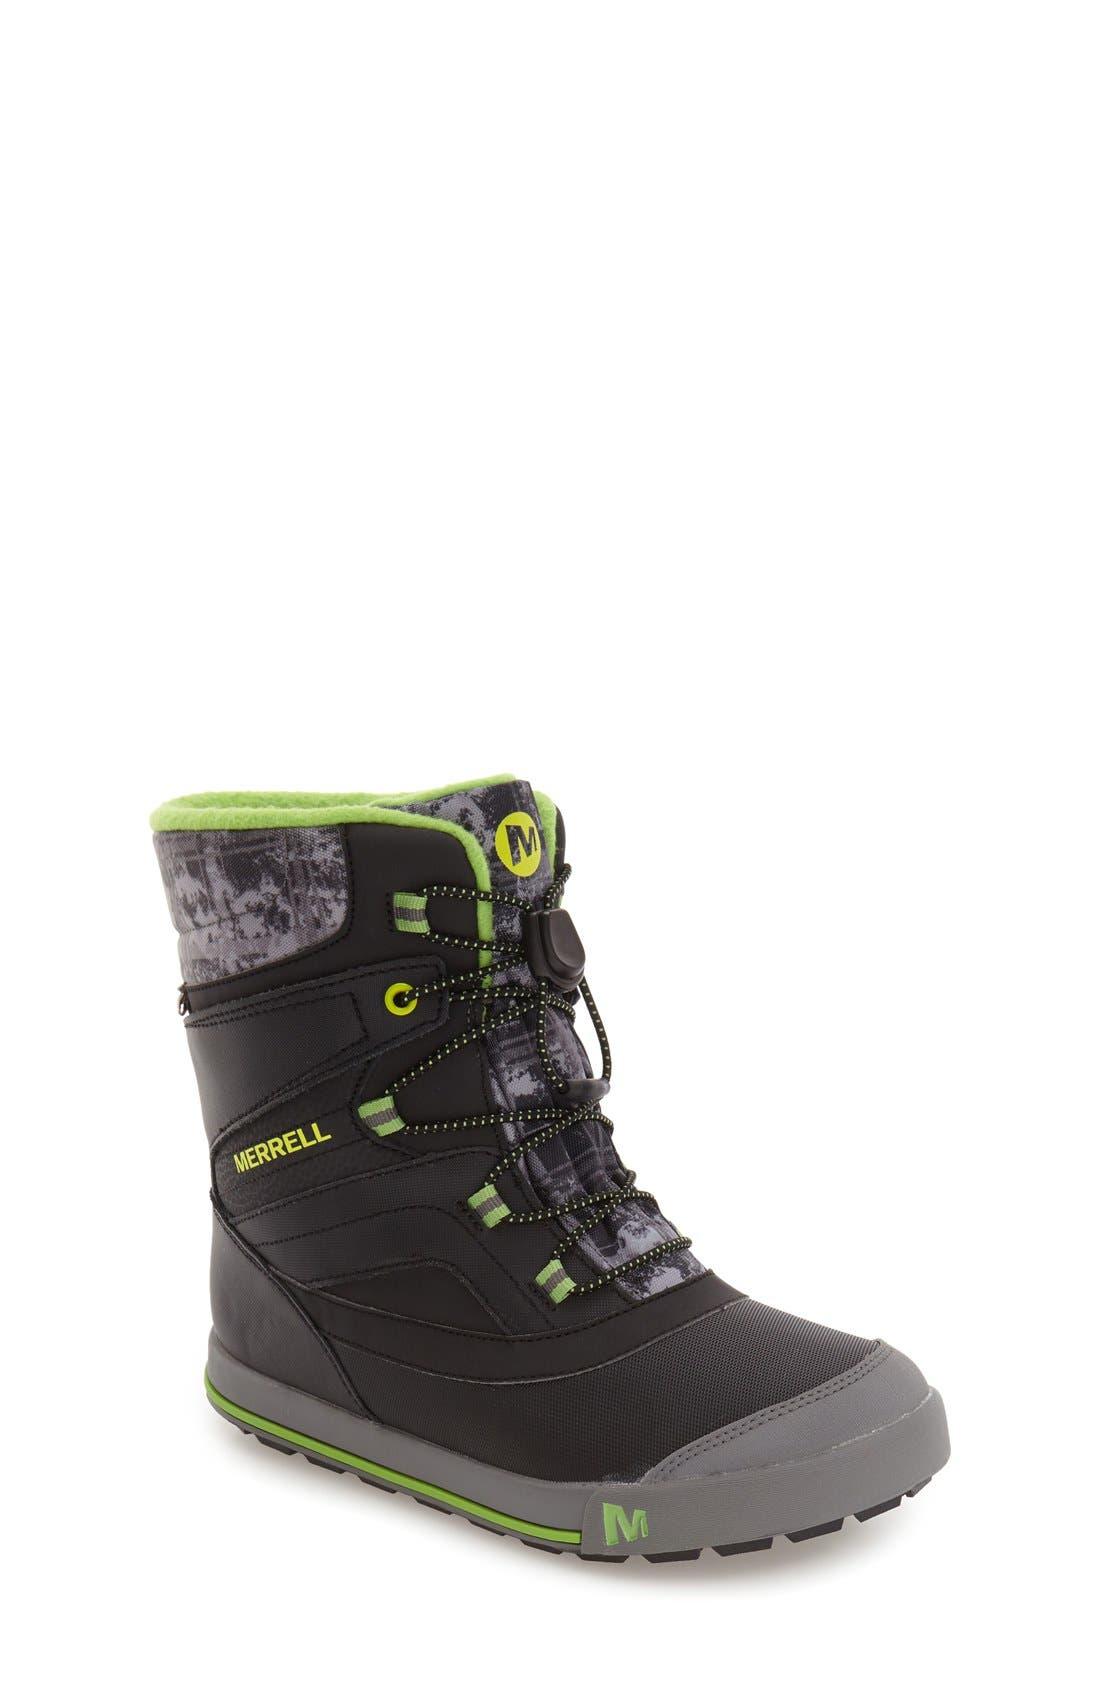 MERRELL, 'Snow Bank 2' Waterproof Boot, Main thumbnail 1, color, 001